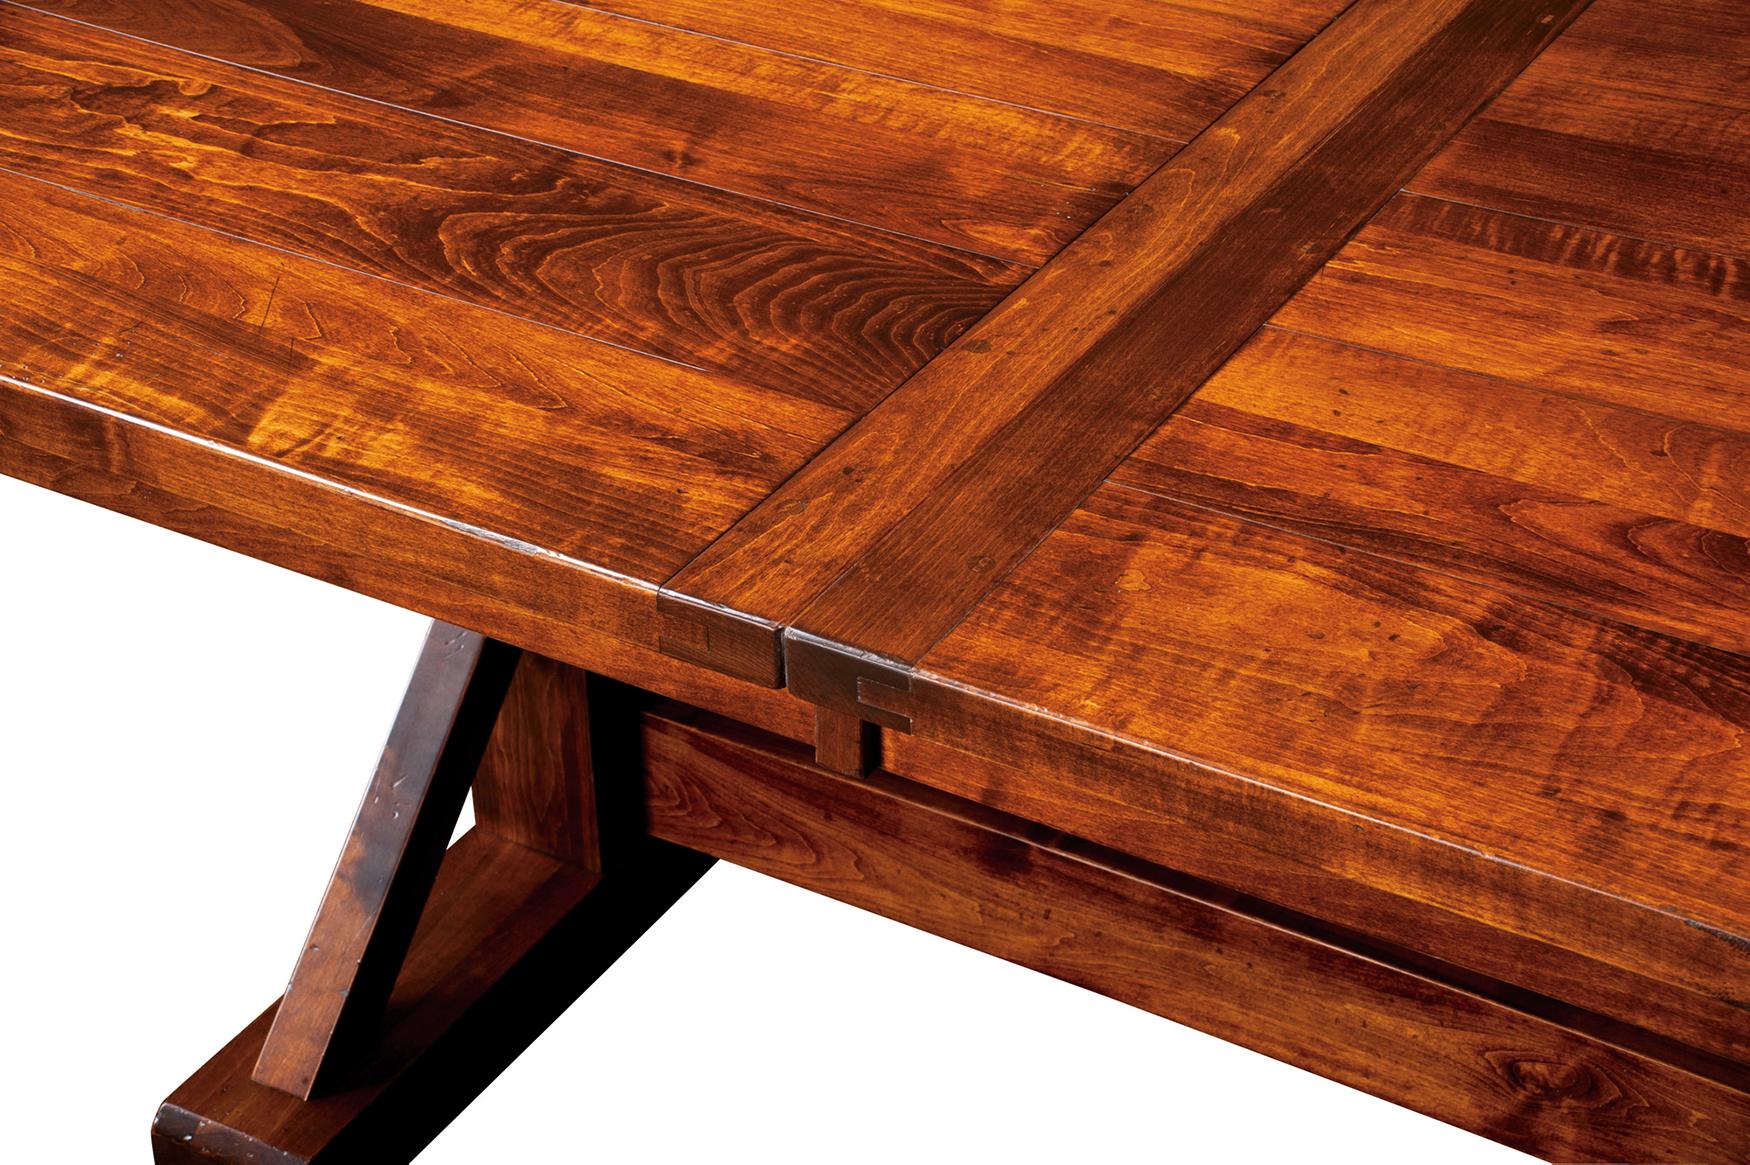 Chesapeake Dining Table Custom Amish Chesapeake Dining Table